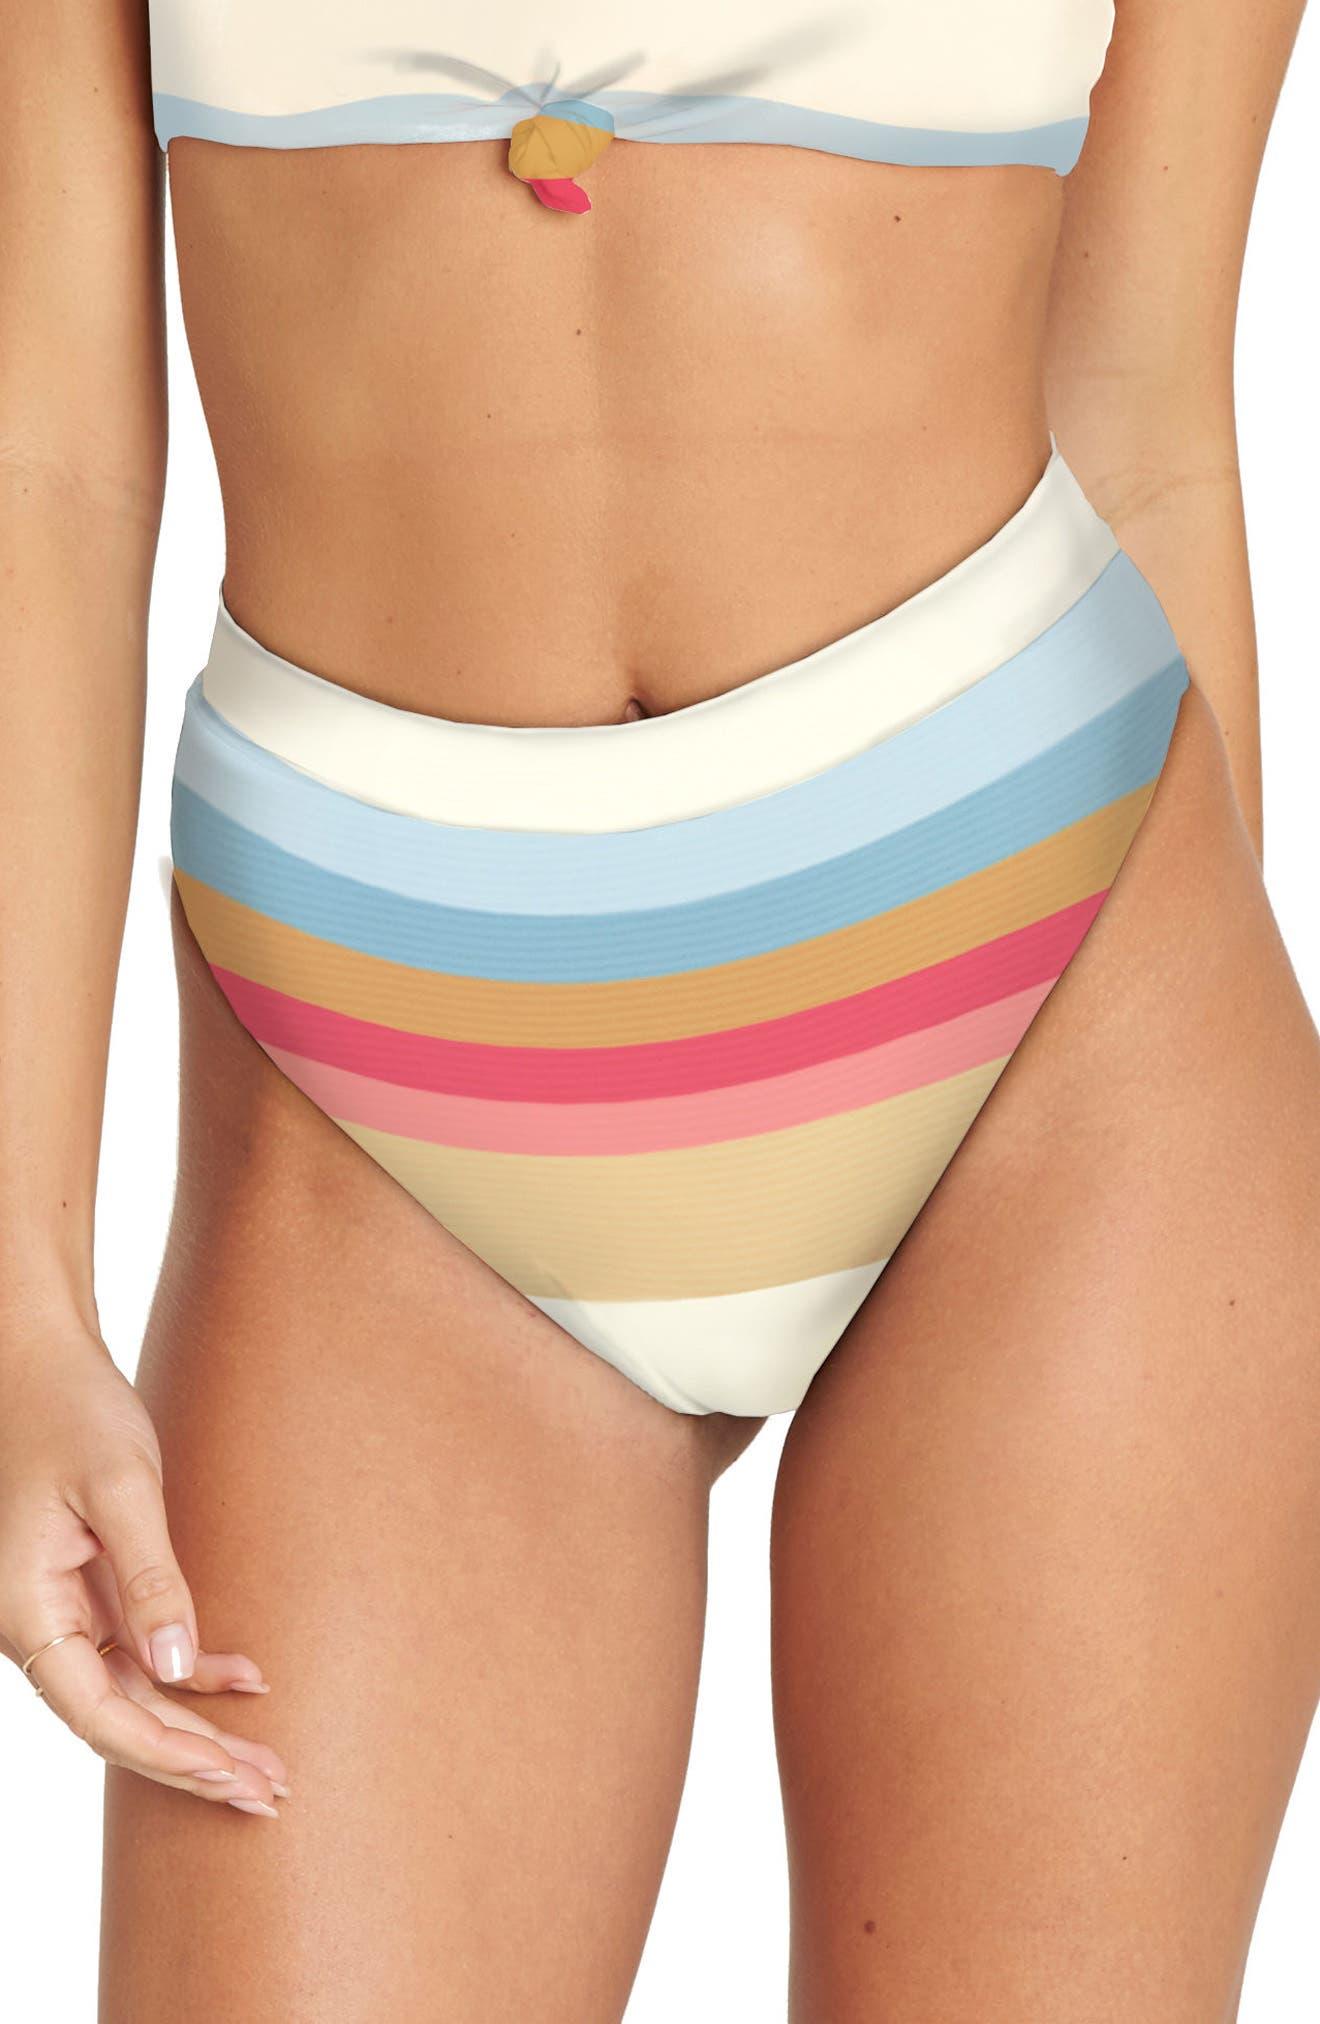 Baja Break High Waist Bikini Bottoms,                         Main,                         color, White Multi